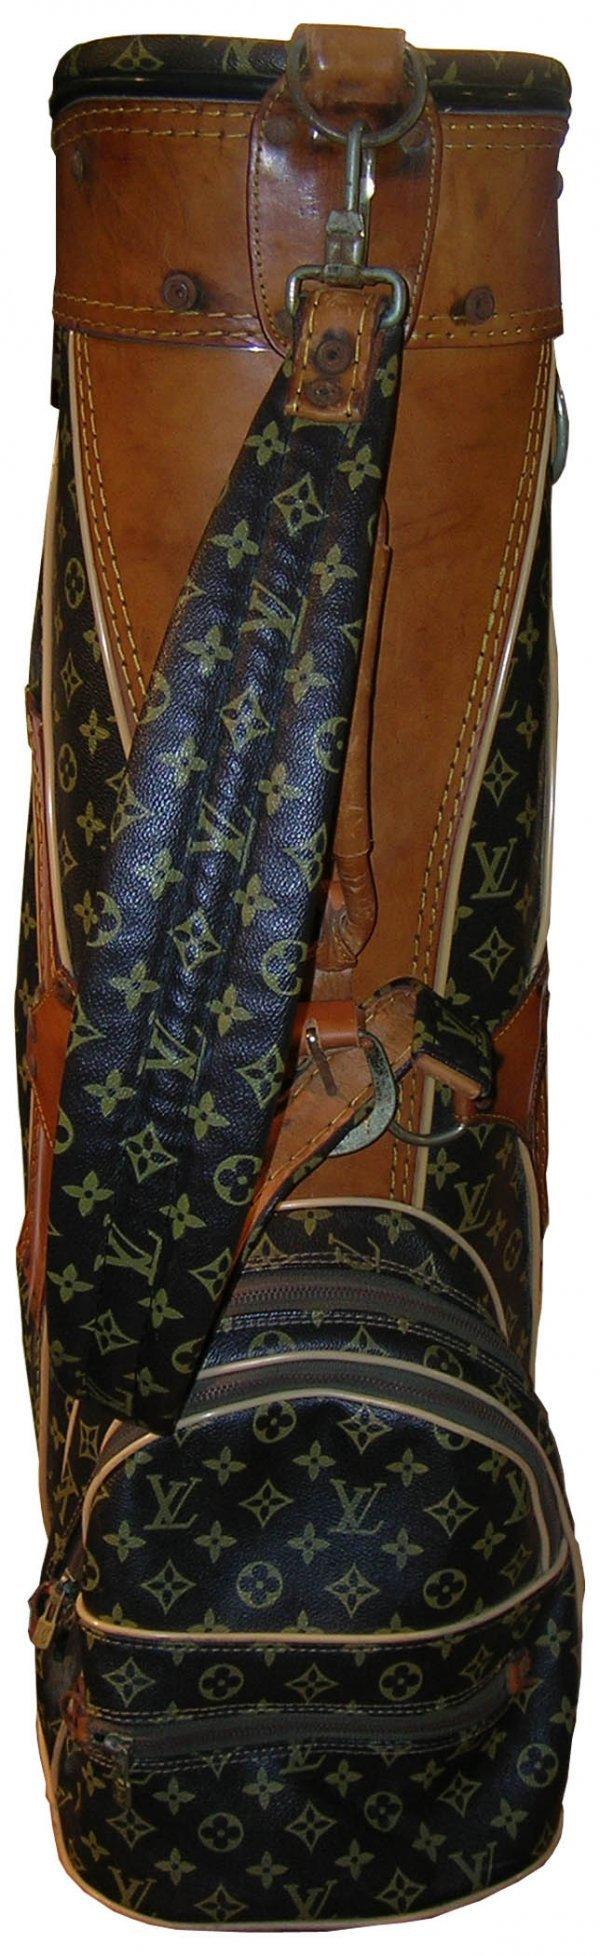 895: Louis Vuitton Golf Bag Vintage Luxury Sports Leath